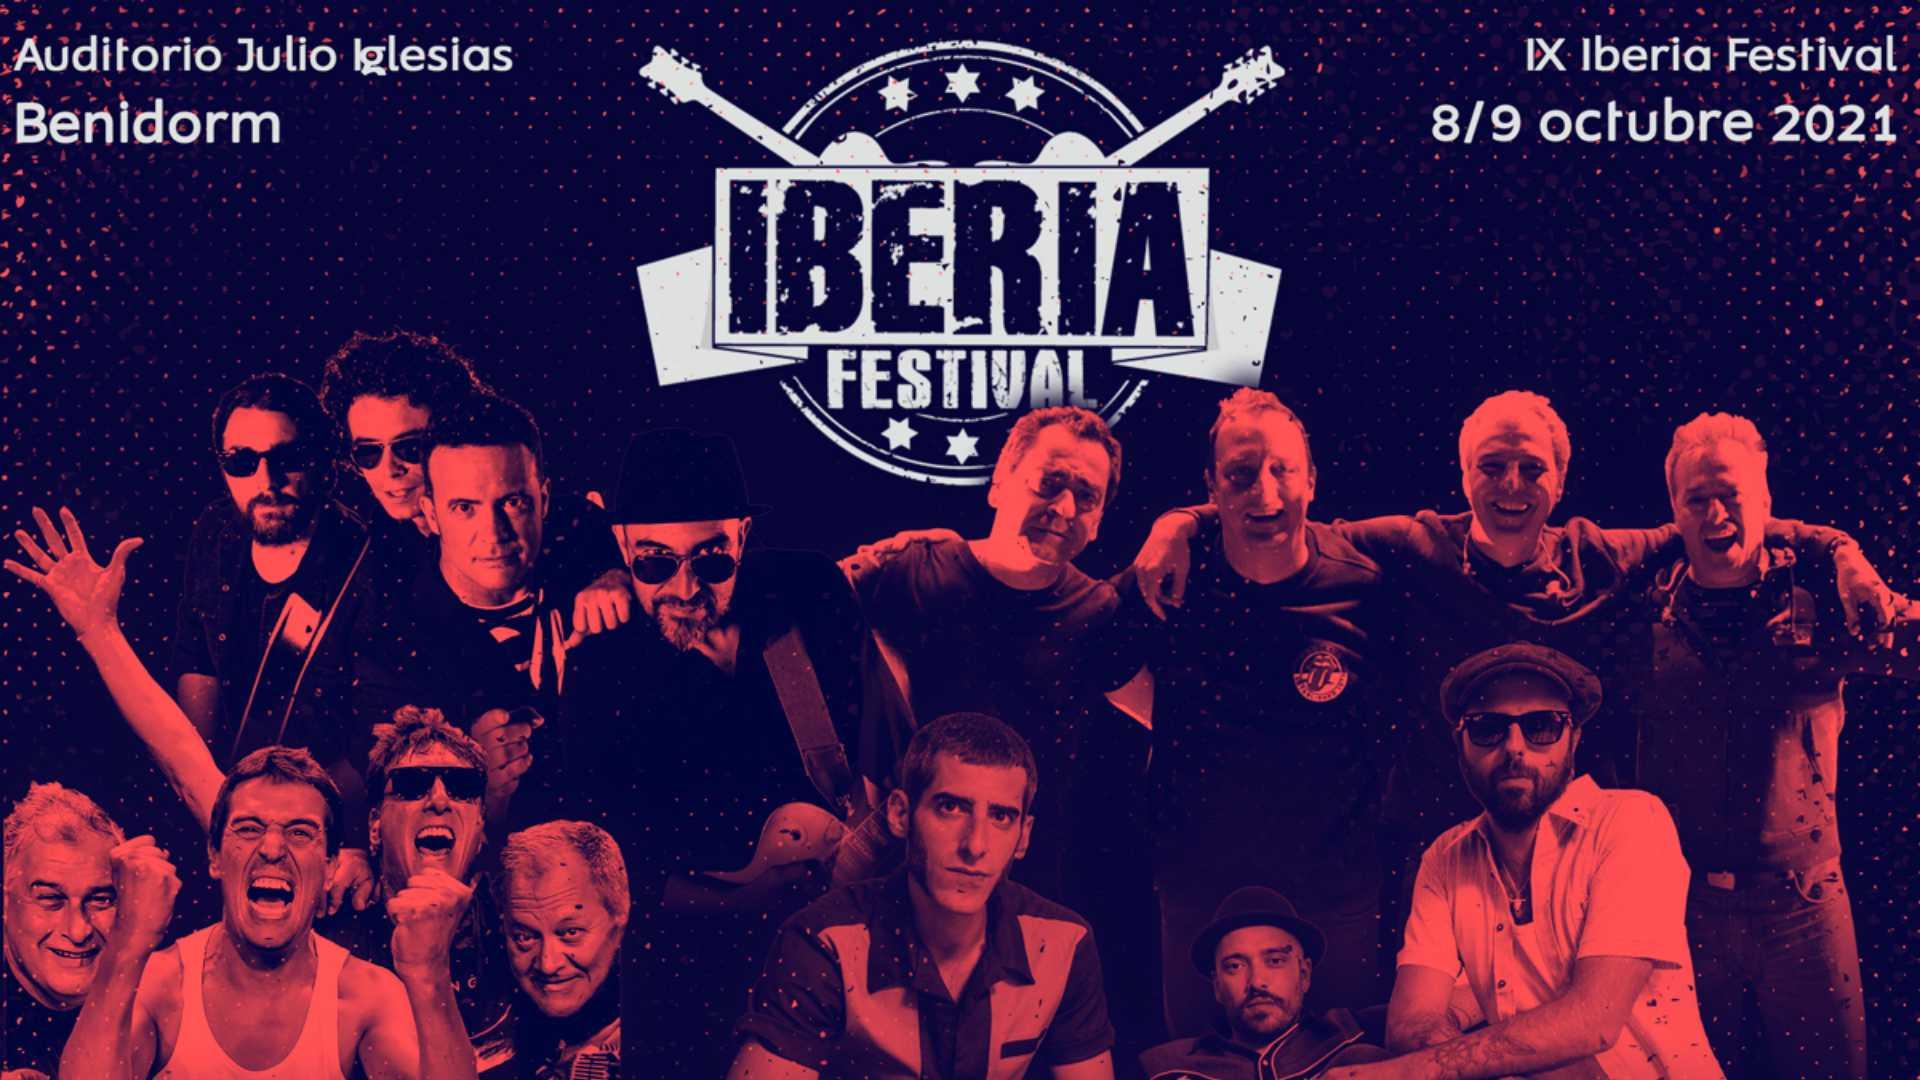 iberia festival benidorm